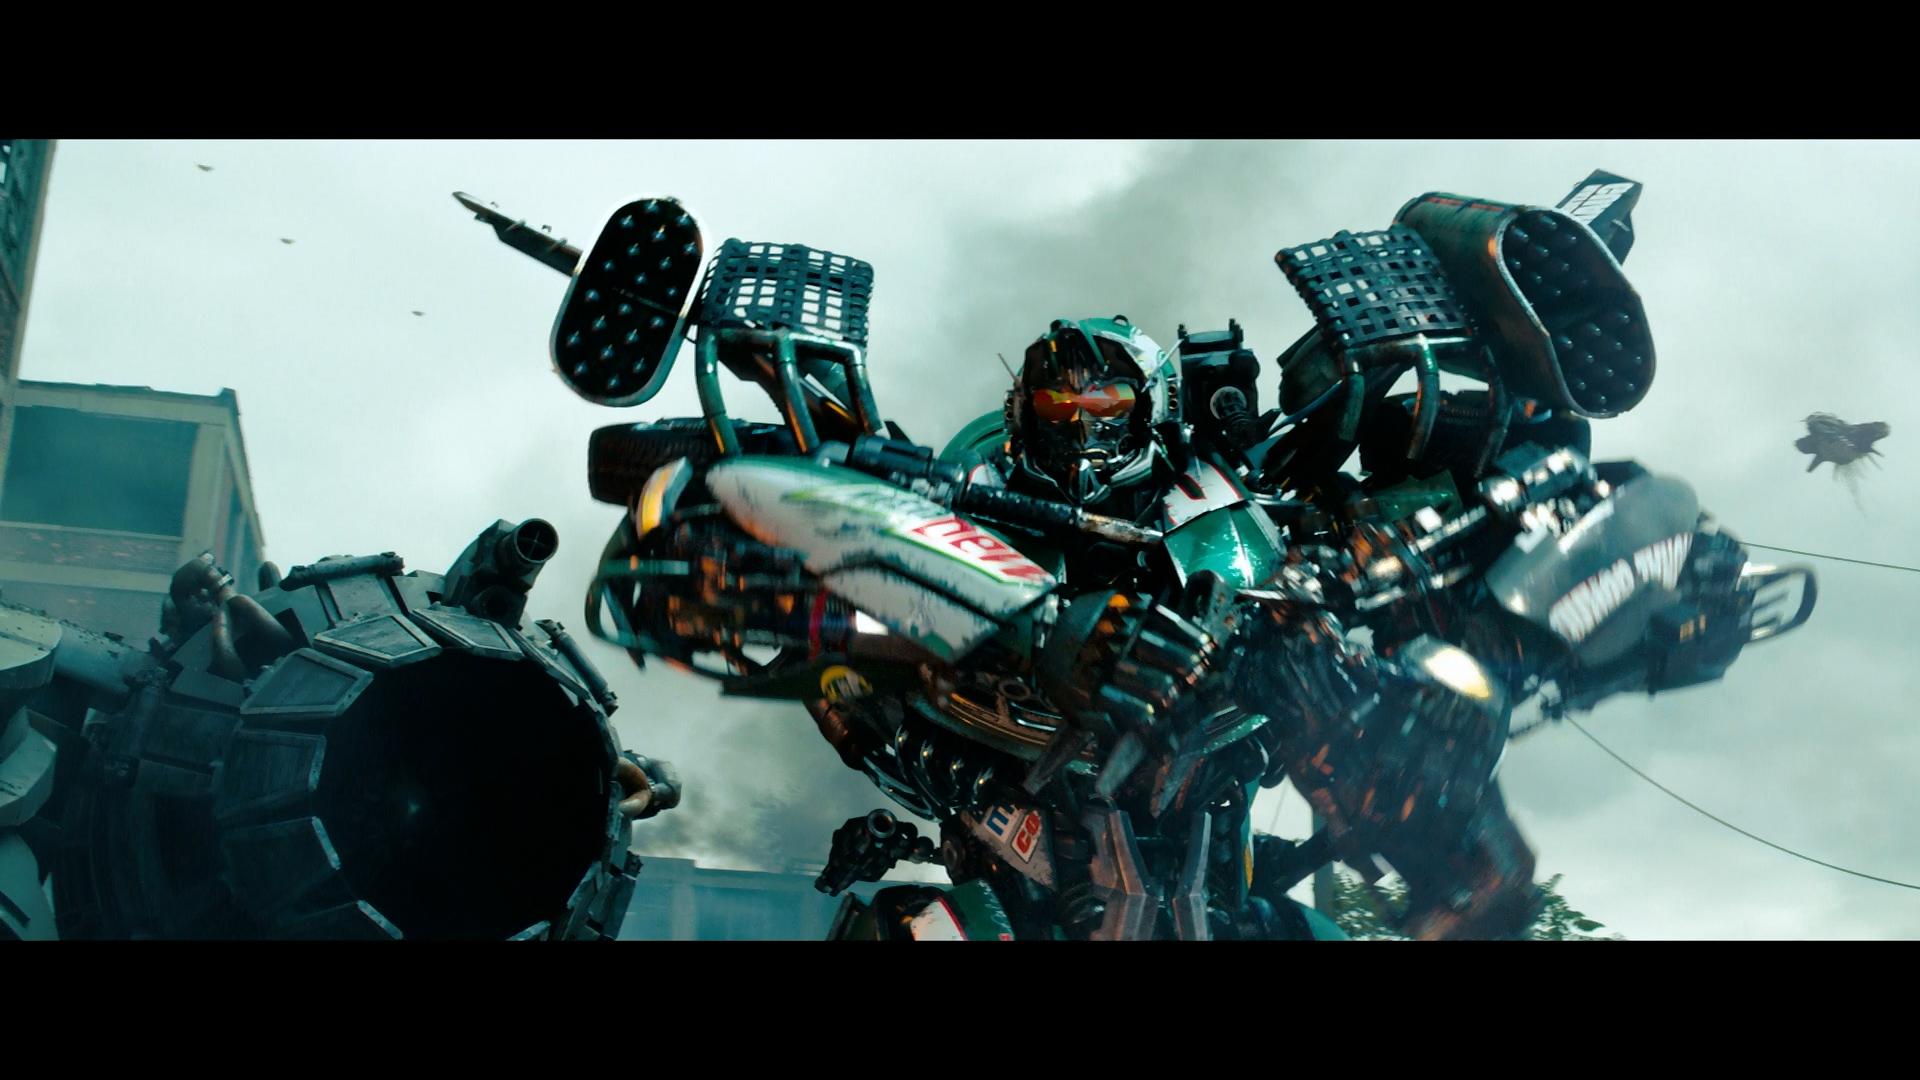 roadbuster (movie) | teletraan i: the transformers wiki | fandom